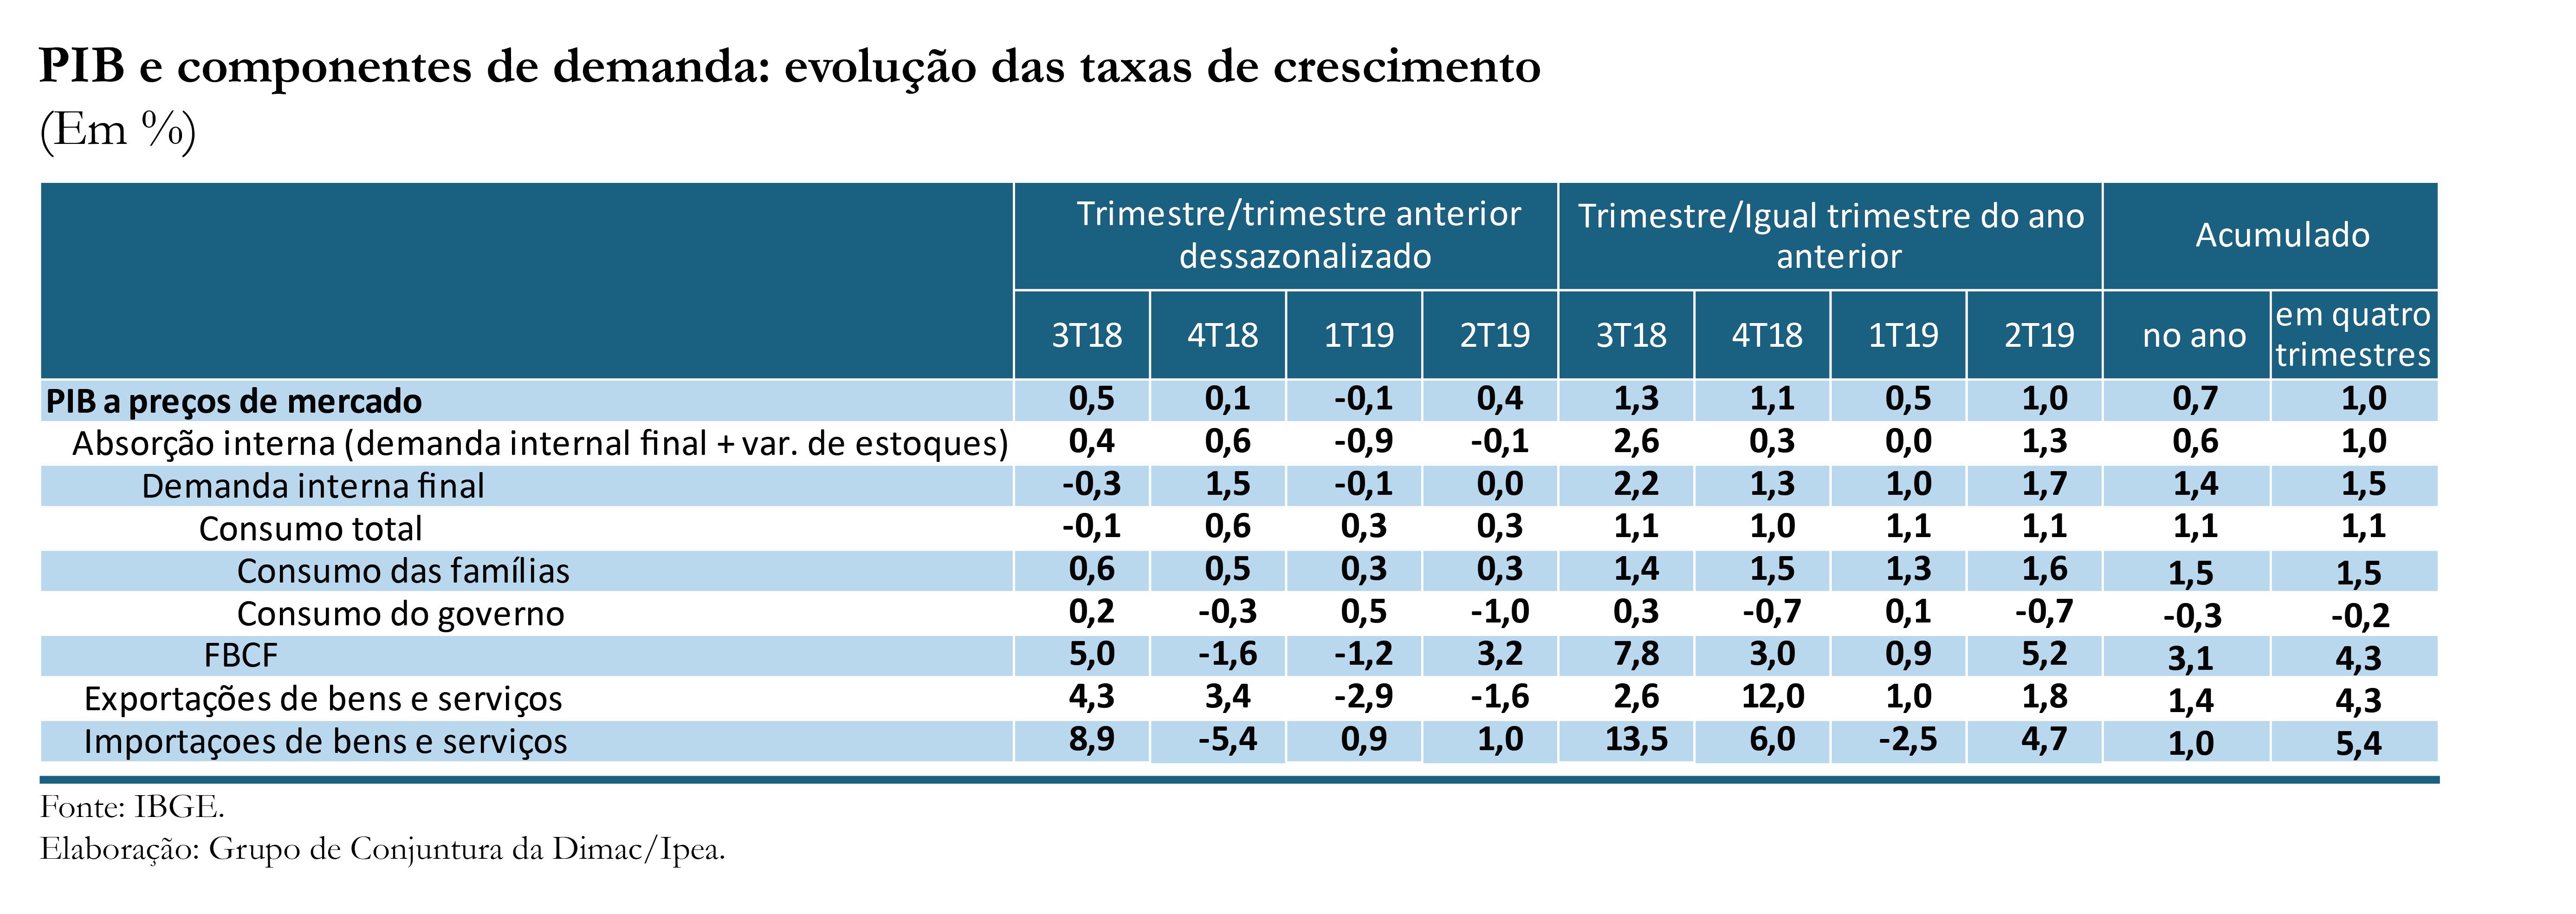 CC44_Atividade-PIB_tabela